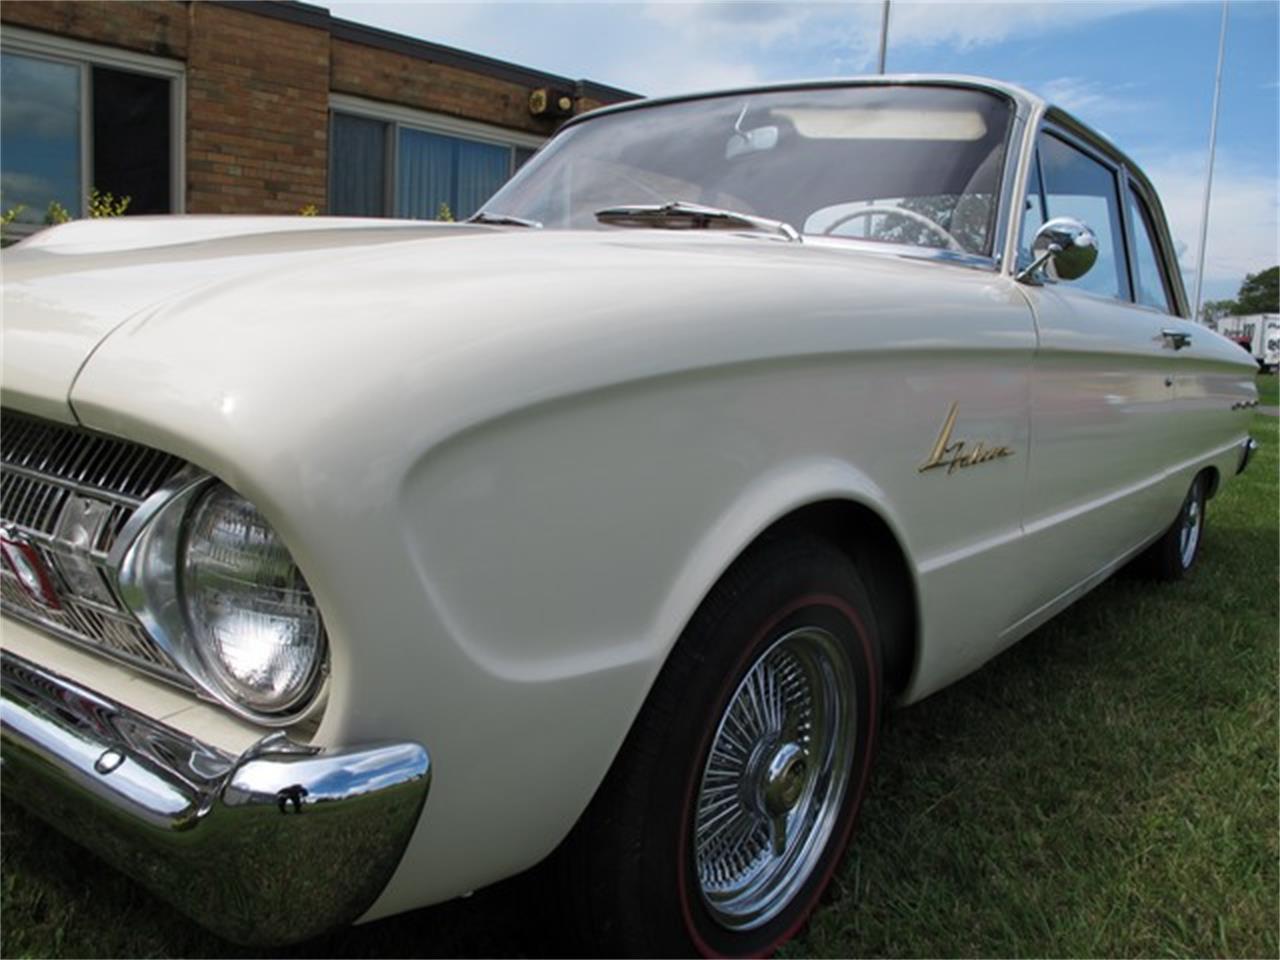 1961 Ford Falcon for Sale | ClassicCars.com | CC-919807